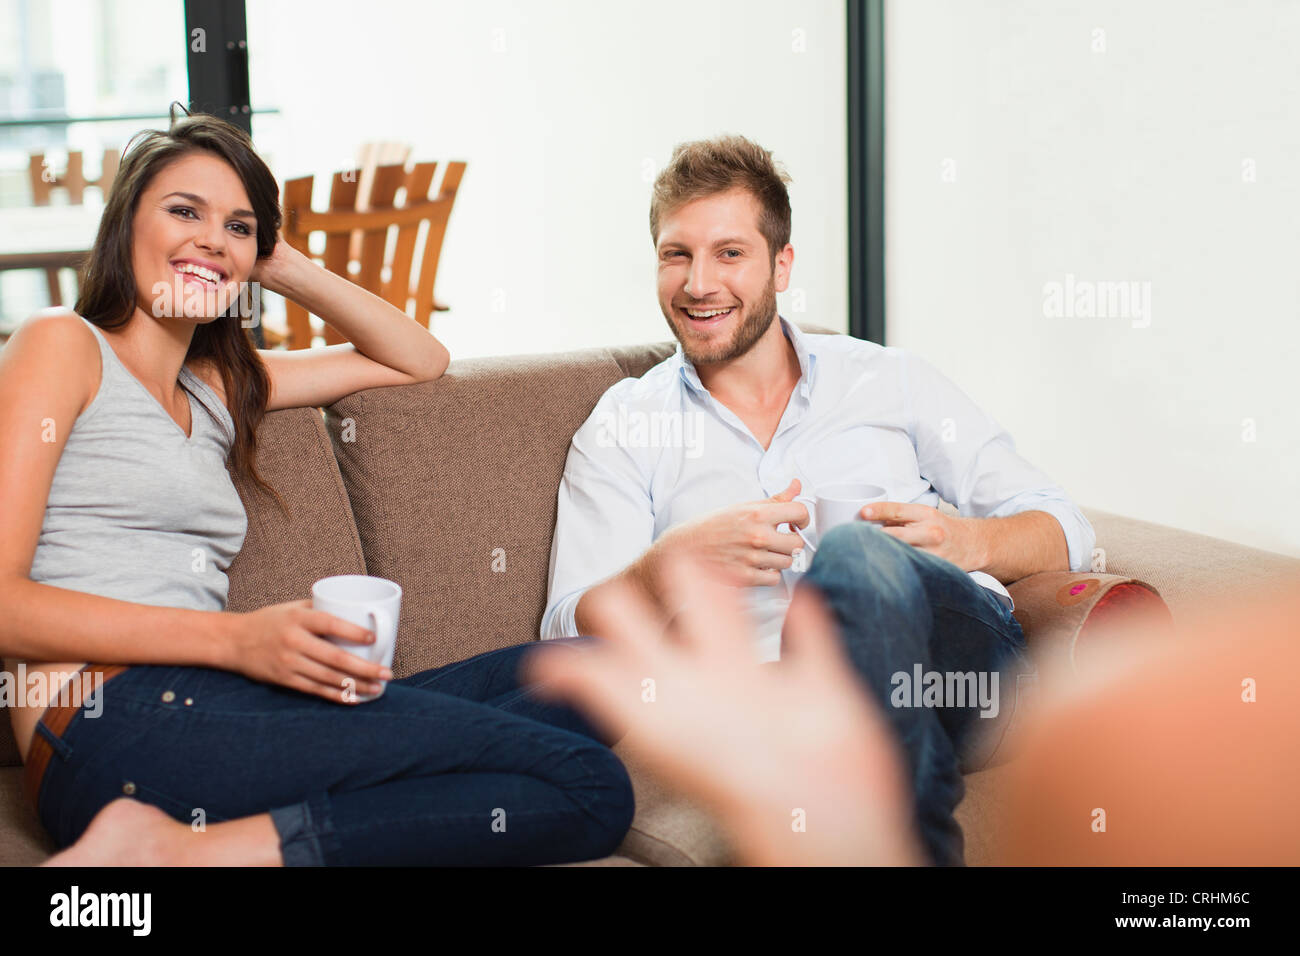 Couple having coffee together on sofa - Stock Image